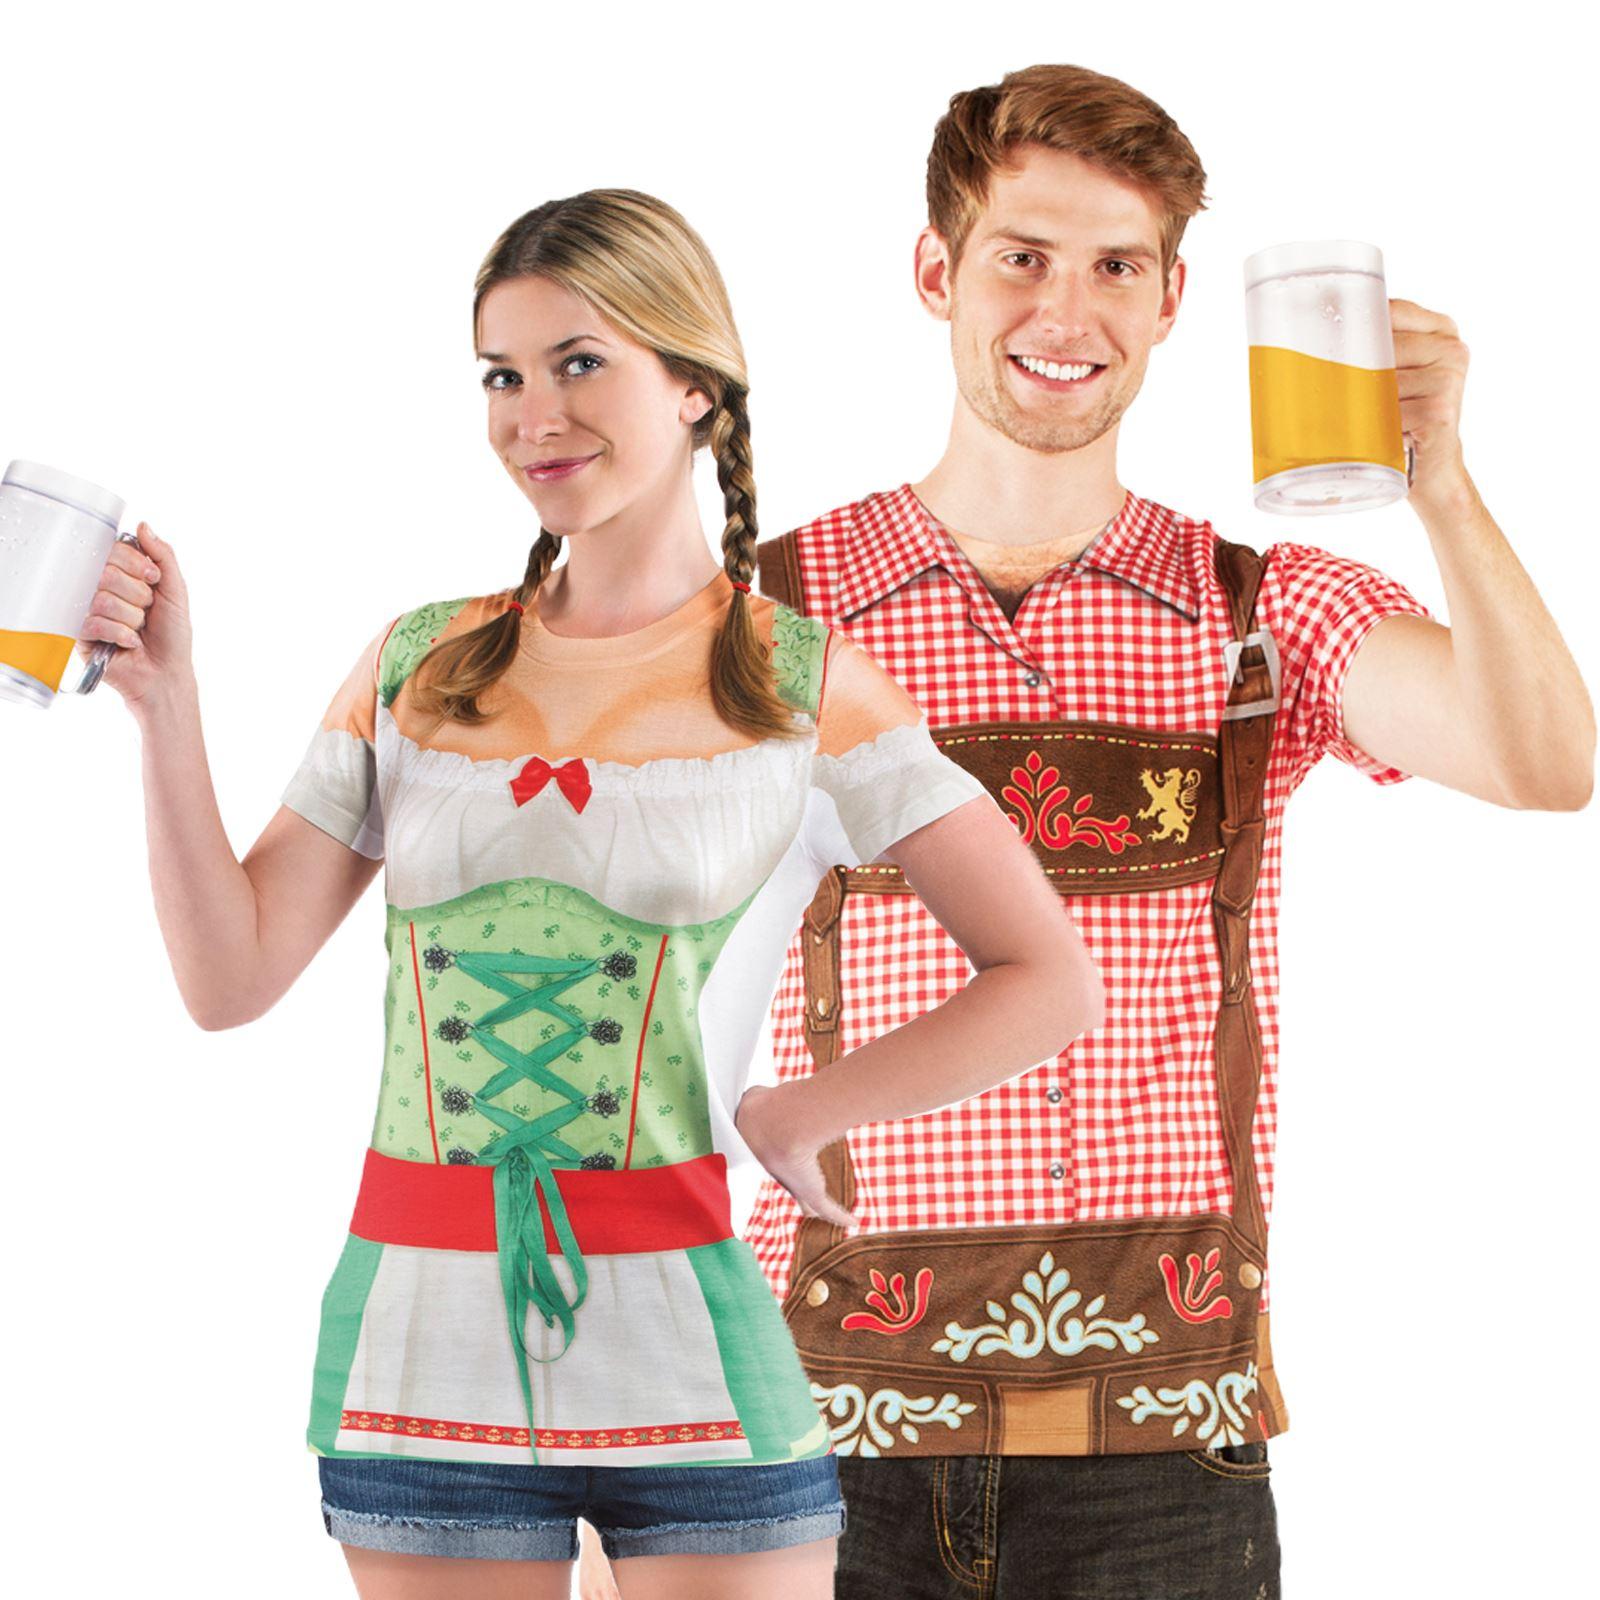 Fest Damen Deutsches Lederhosen Herren T Oktoberfest Shirt Pf8x7fz